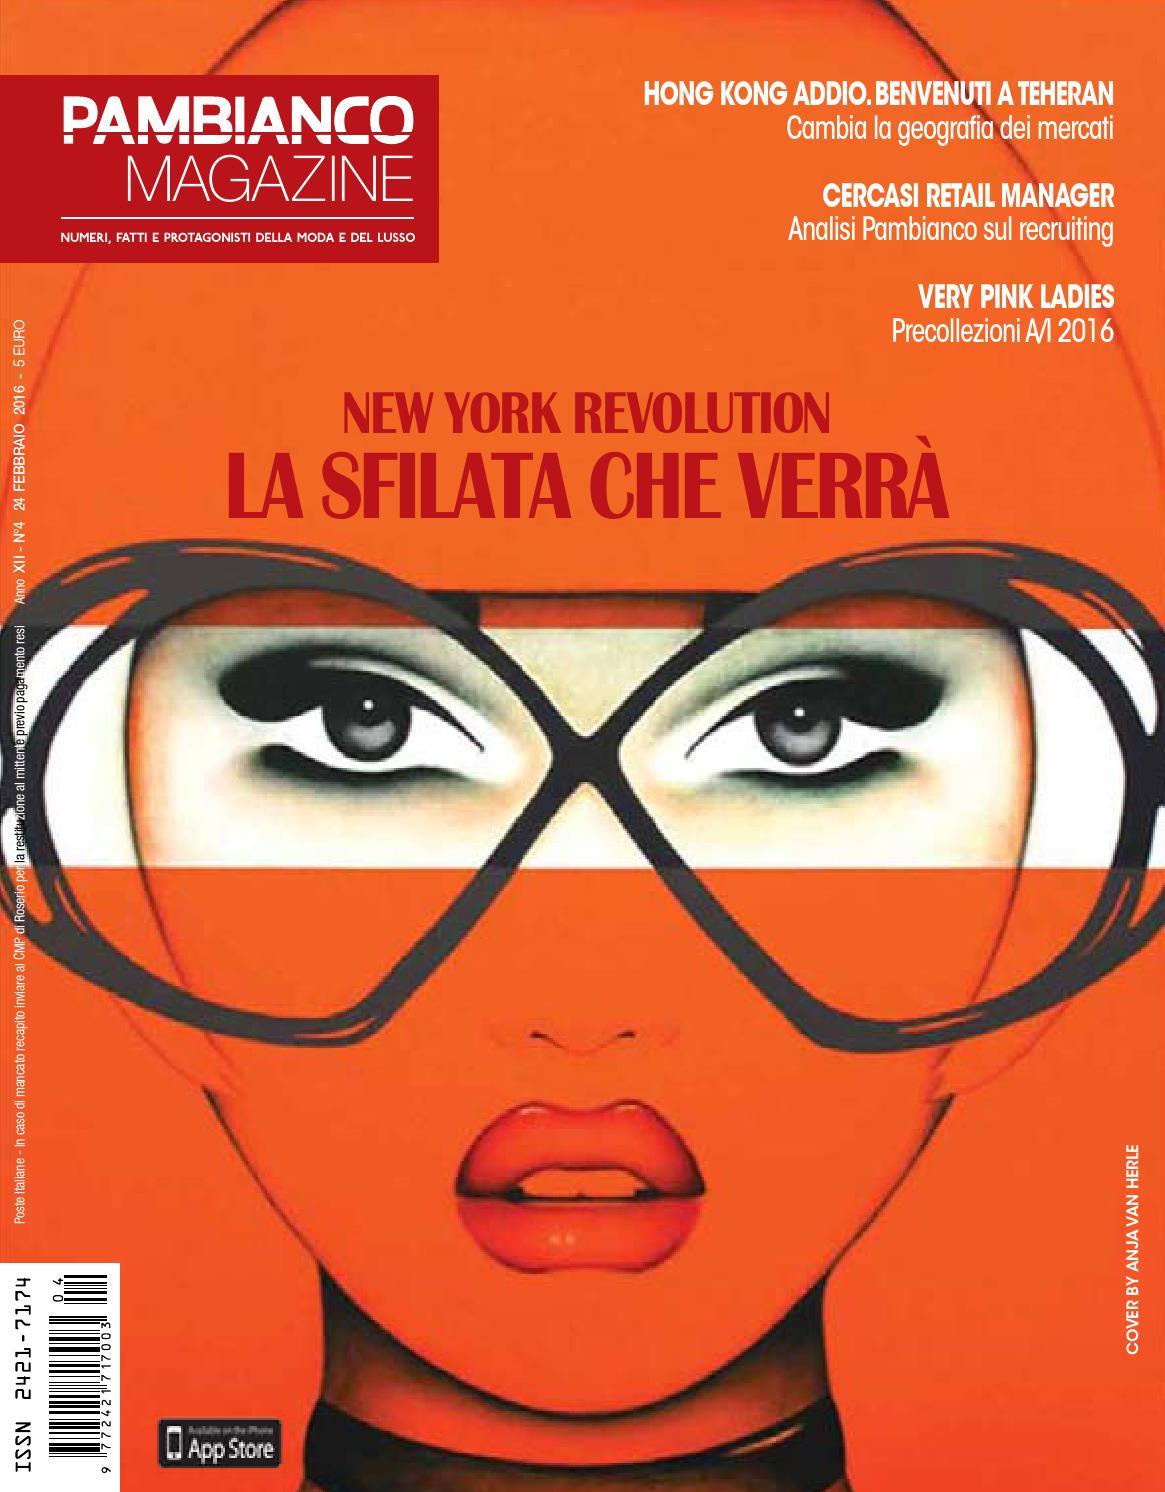 Magazine Pambianco ° 04 By Pambianconews N Xii Issuu qUVSzMp